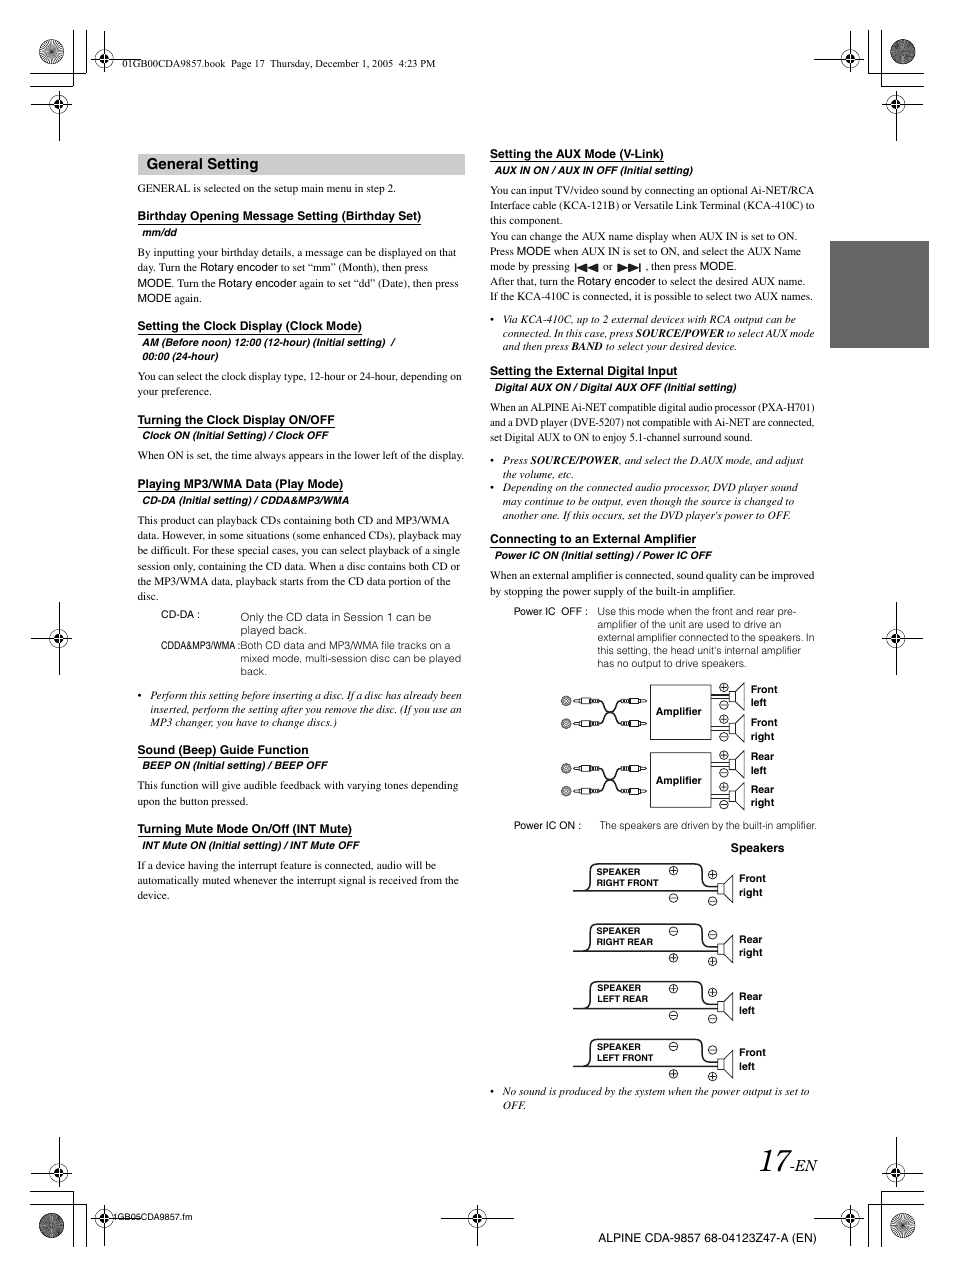 general setting alpine cda 9857 user manual page 19 38 rh manualsdir com  cda-9857r manual